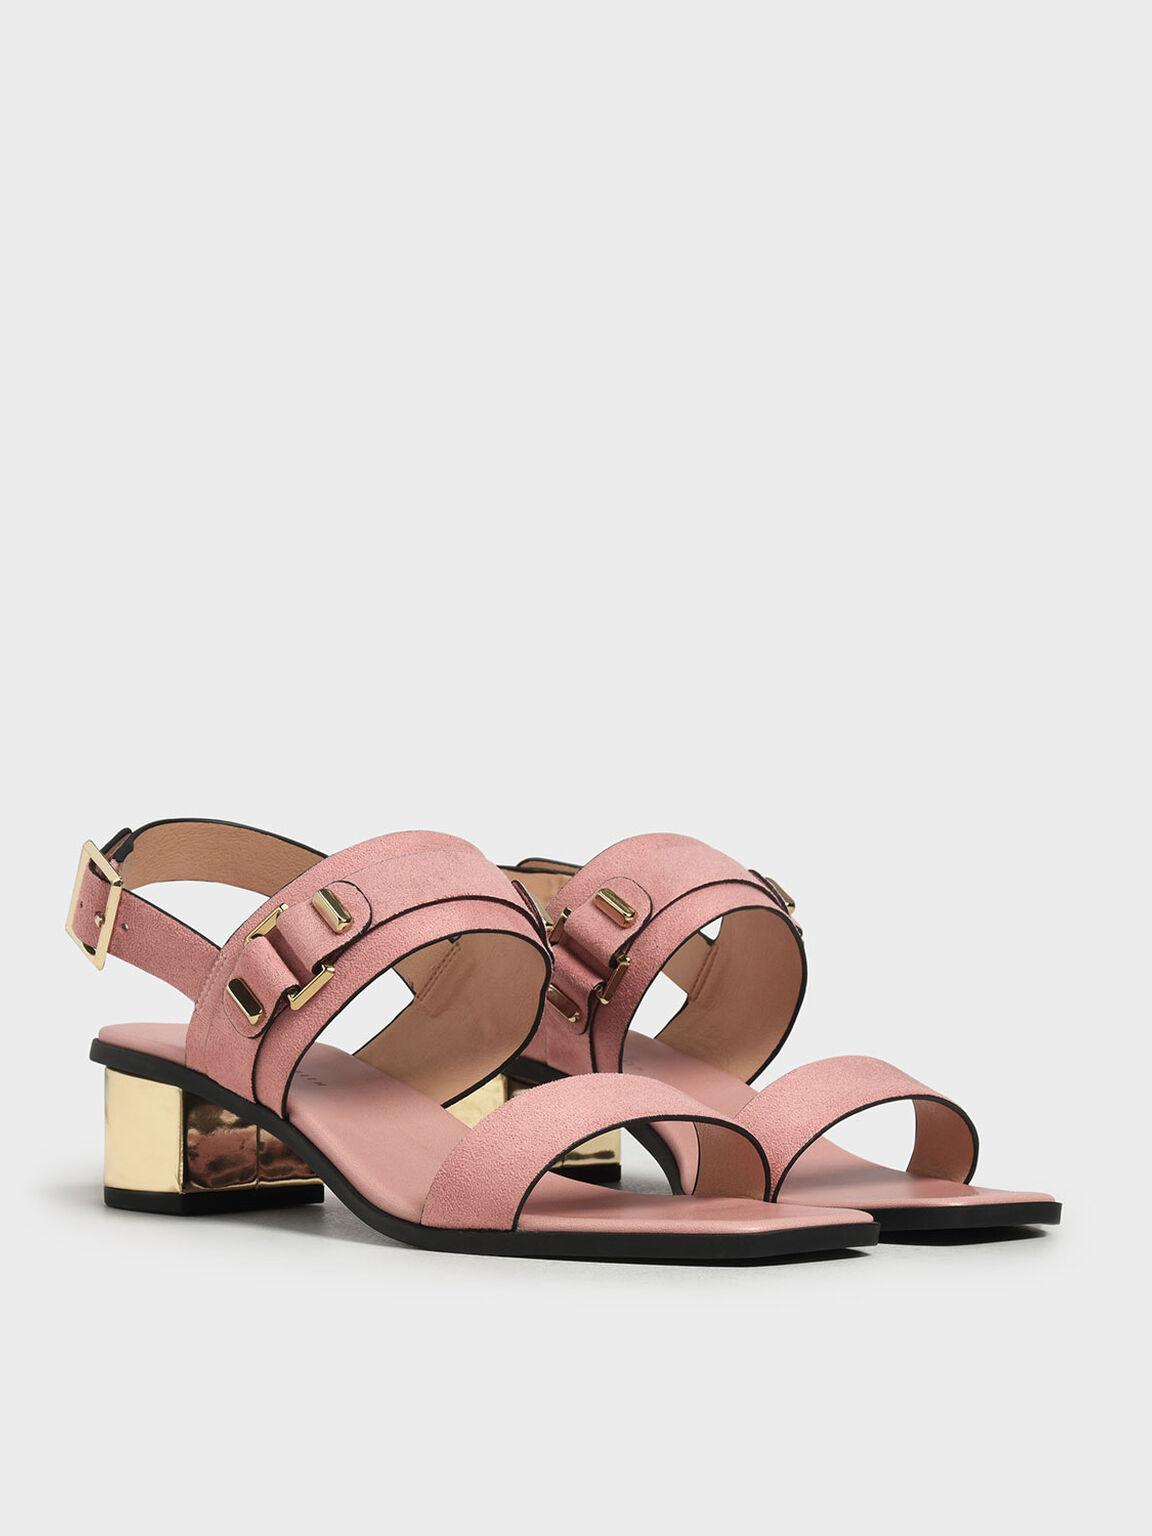 Chrome Block Heel Sandals, Blush, hi-res